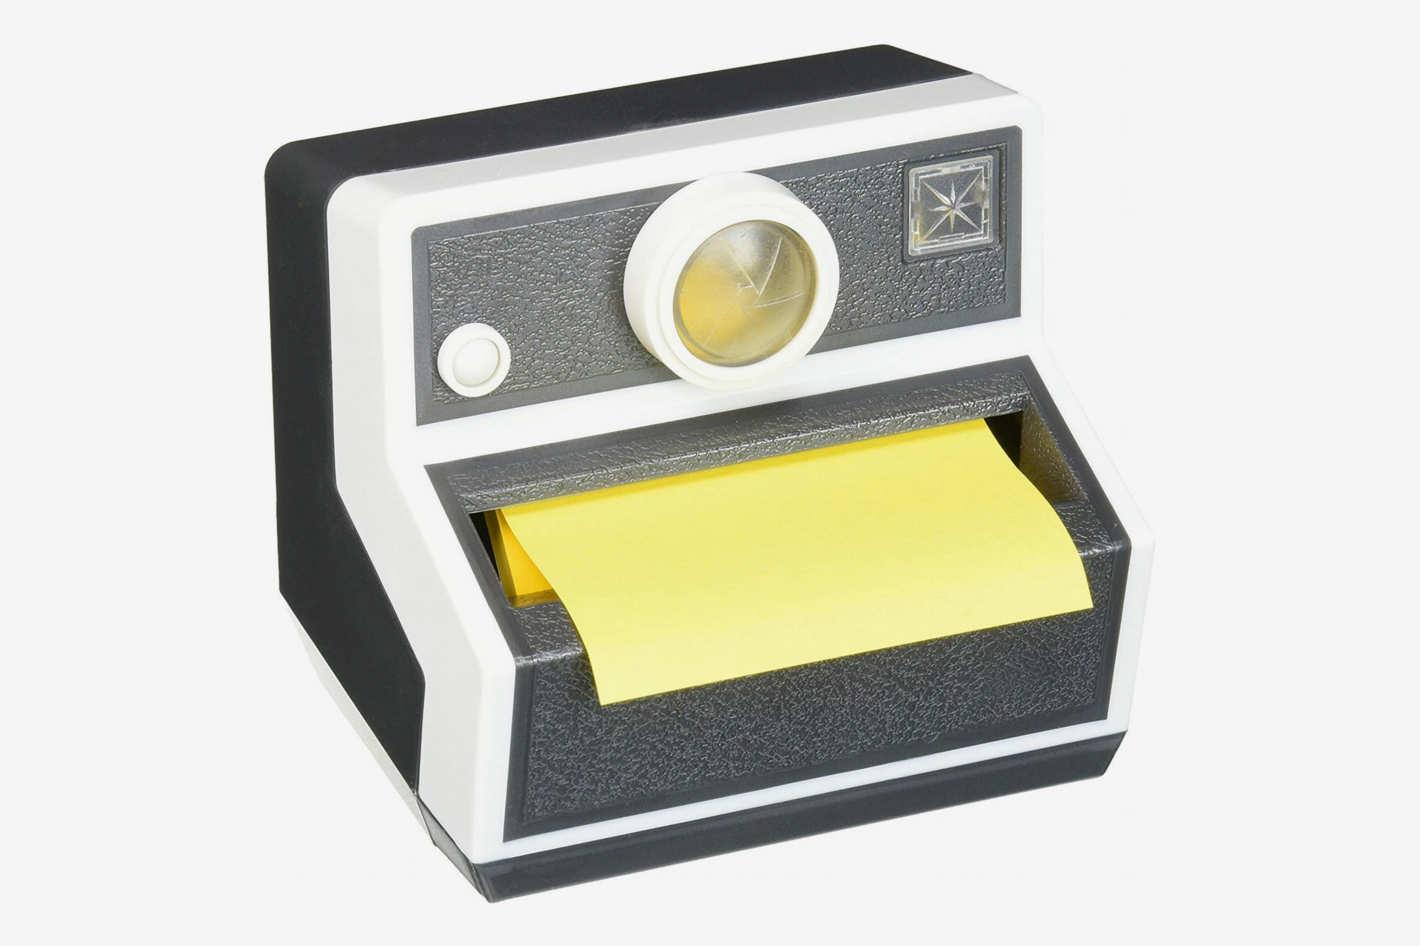 3M Pop-Up Note Dispenser